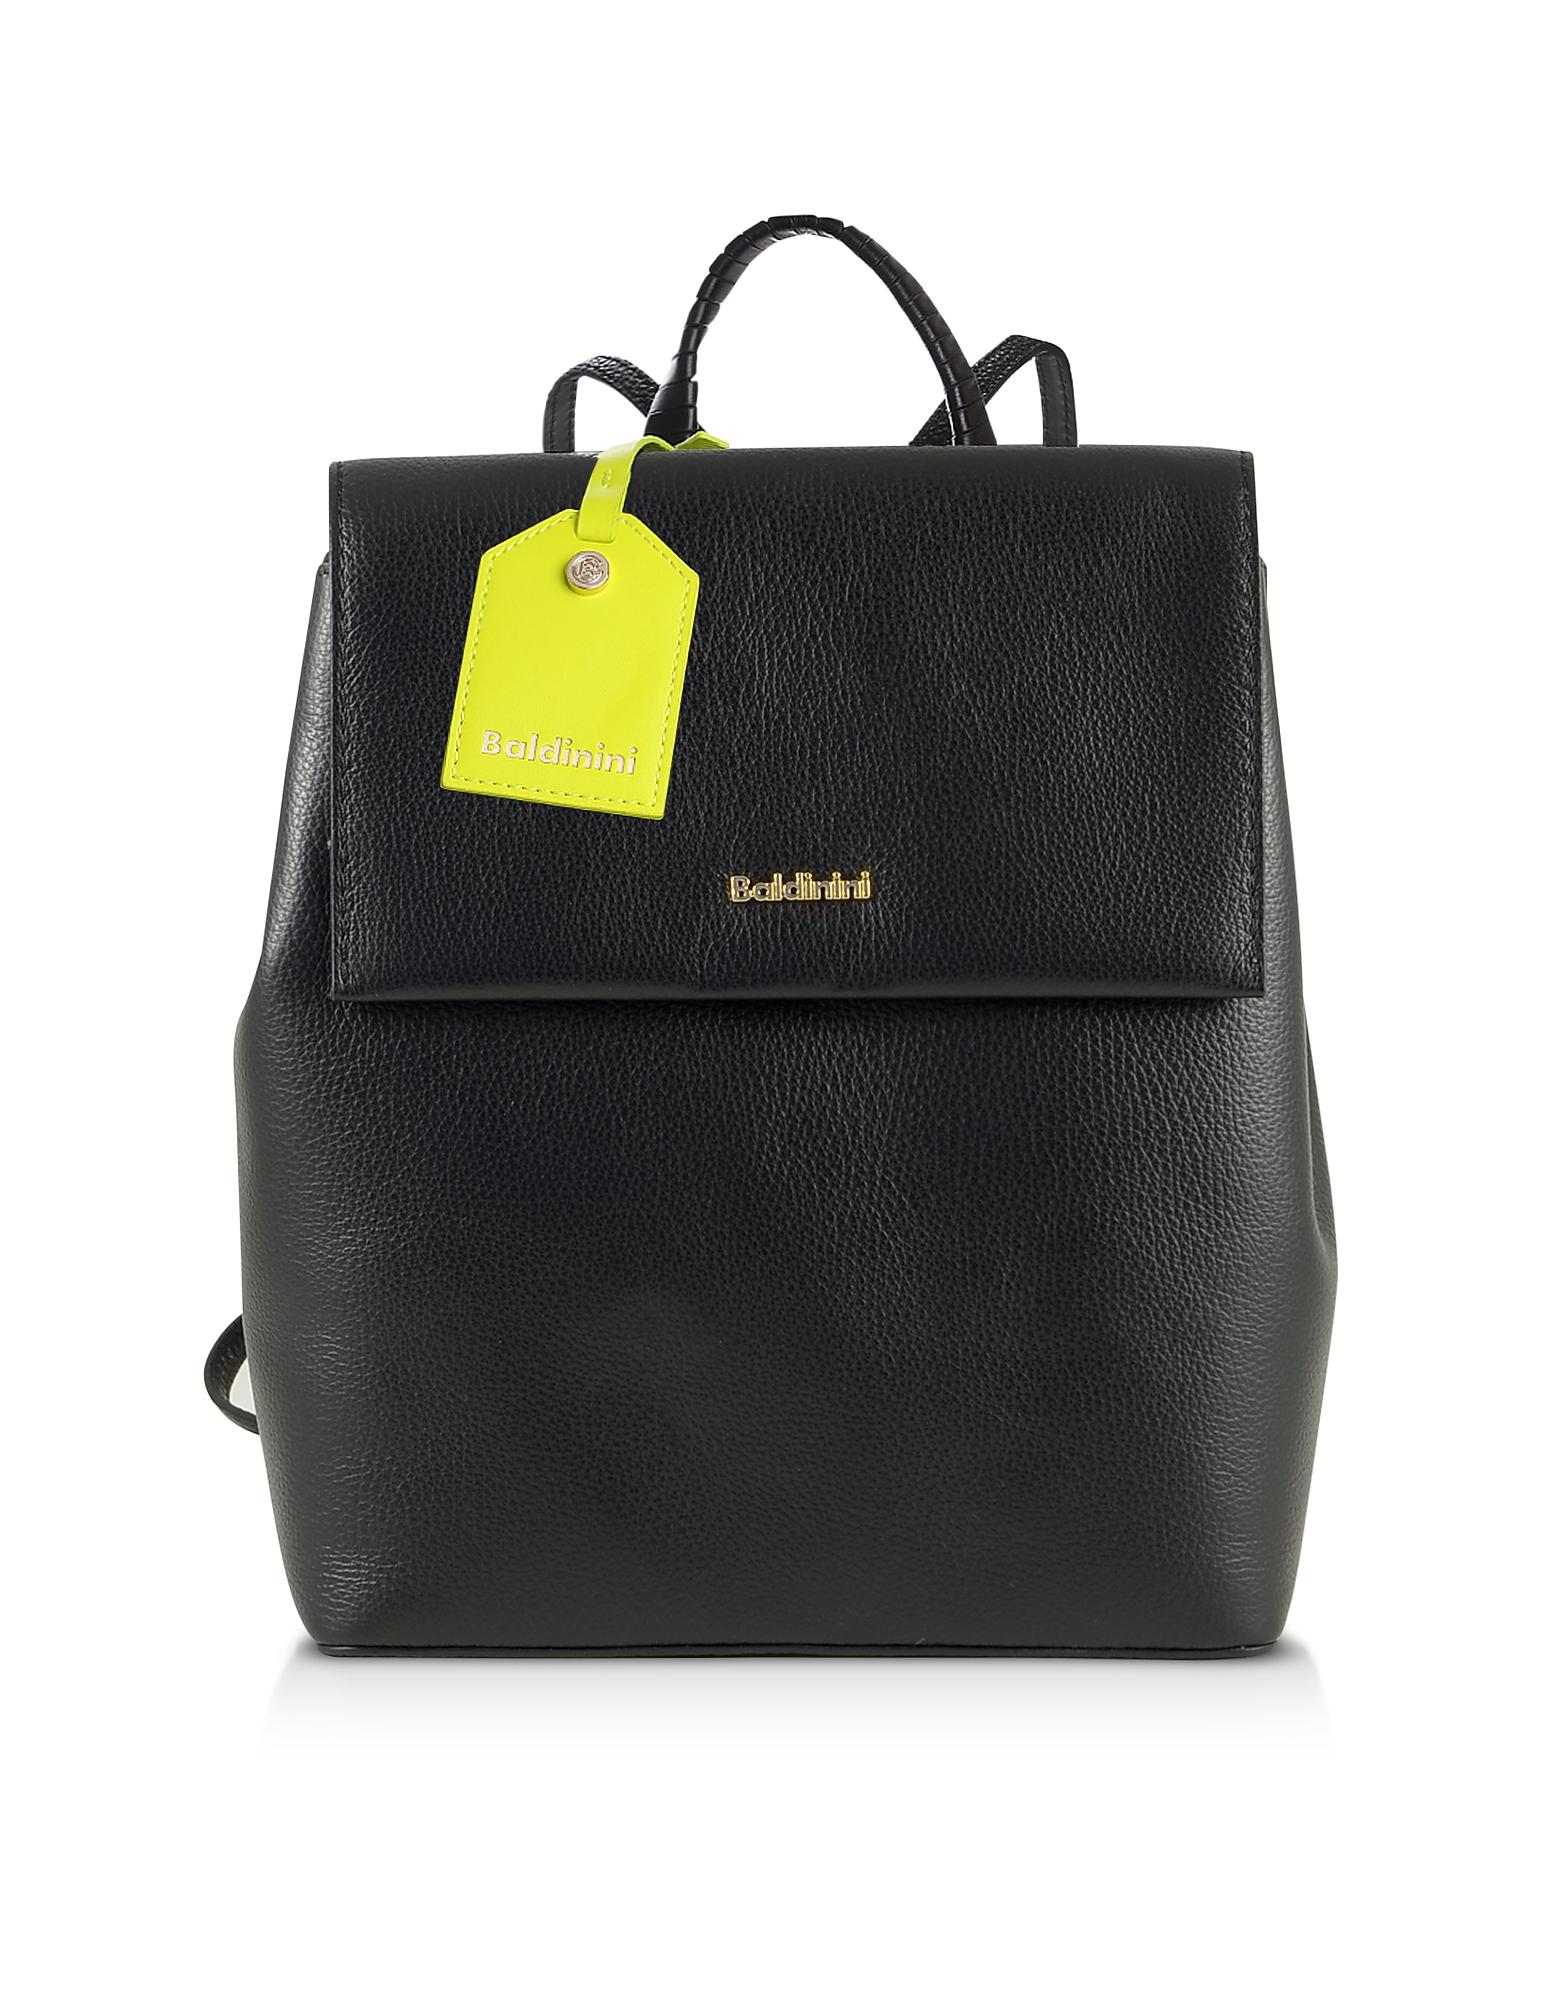 Baldinini Designer Handbags, Black Eco-Leather Backpack